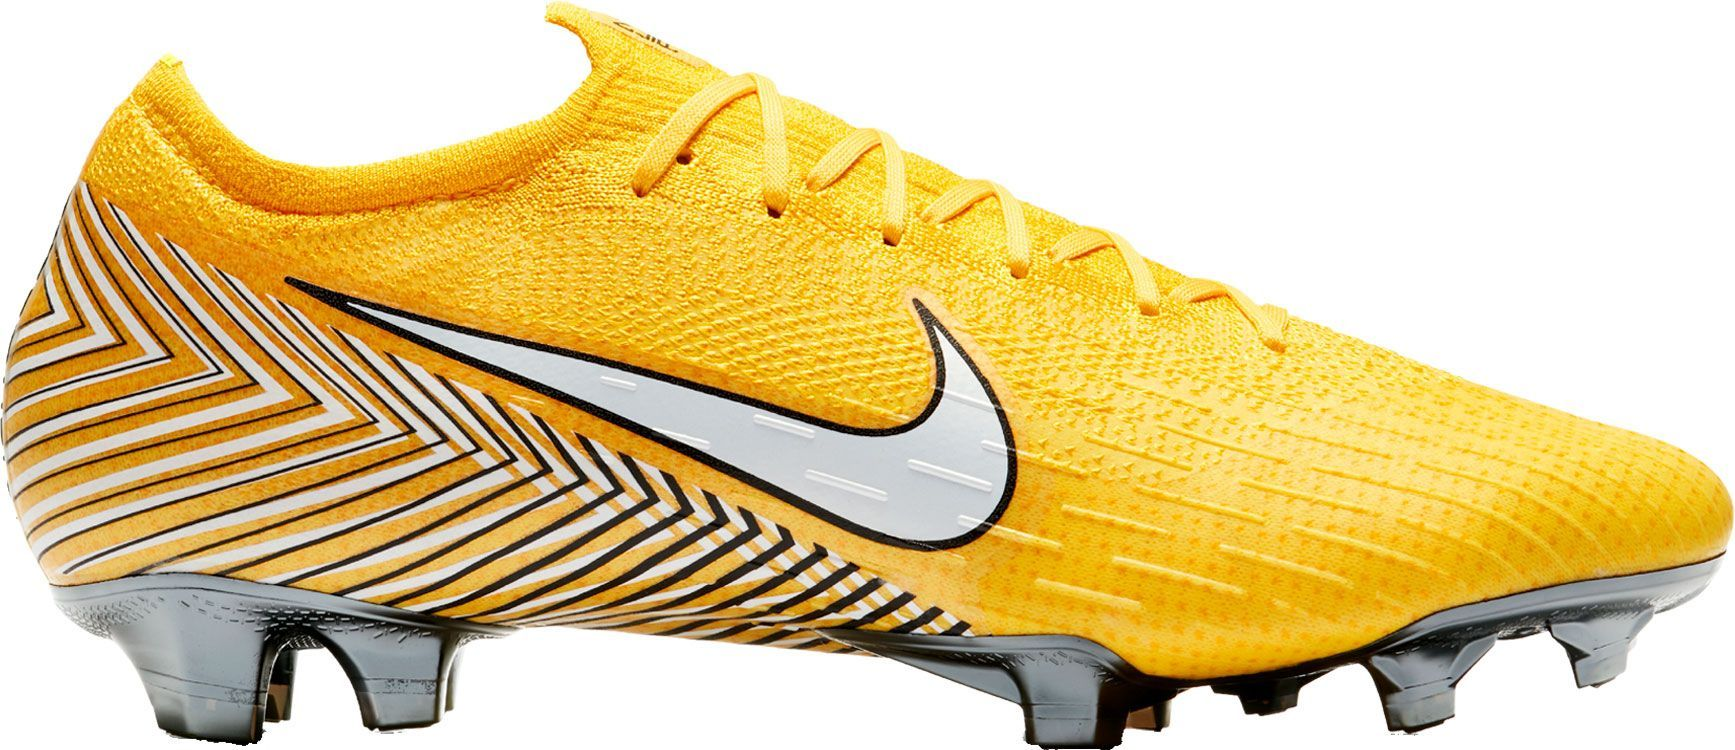 7e2f279cf Nike Mercurial Neymar Vapor 12 Elite FG Soccer Cleats